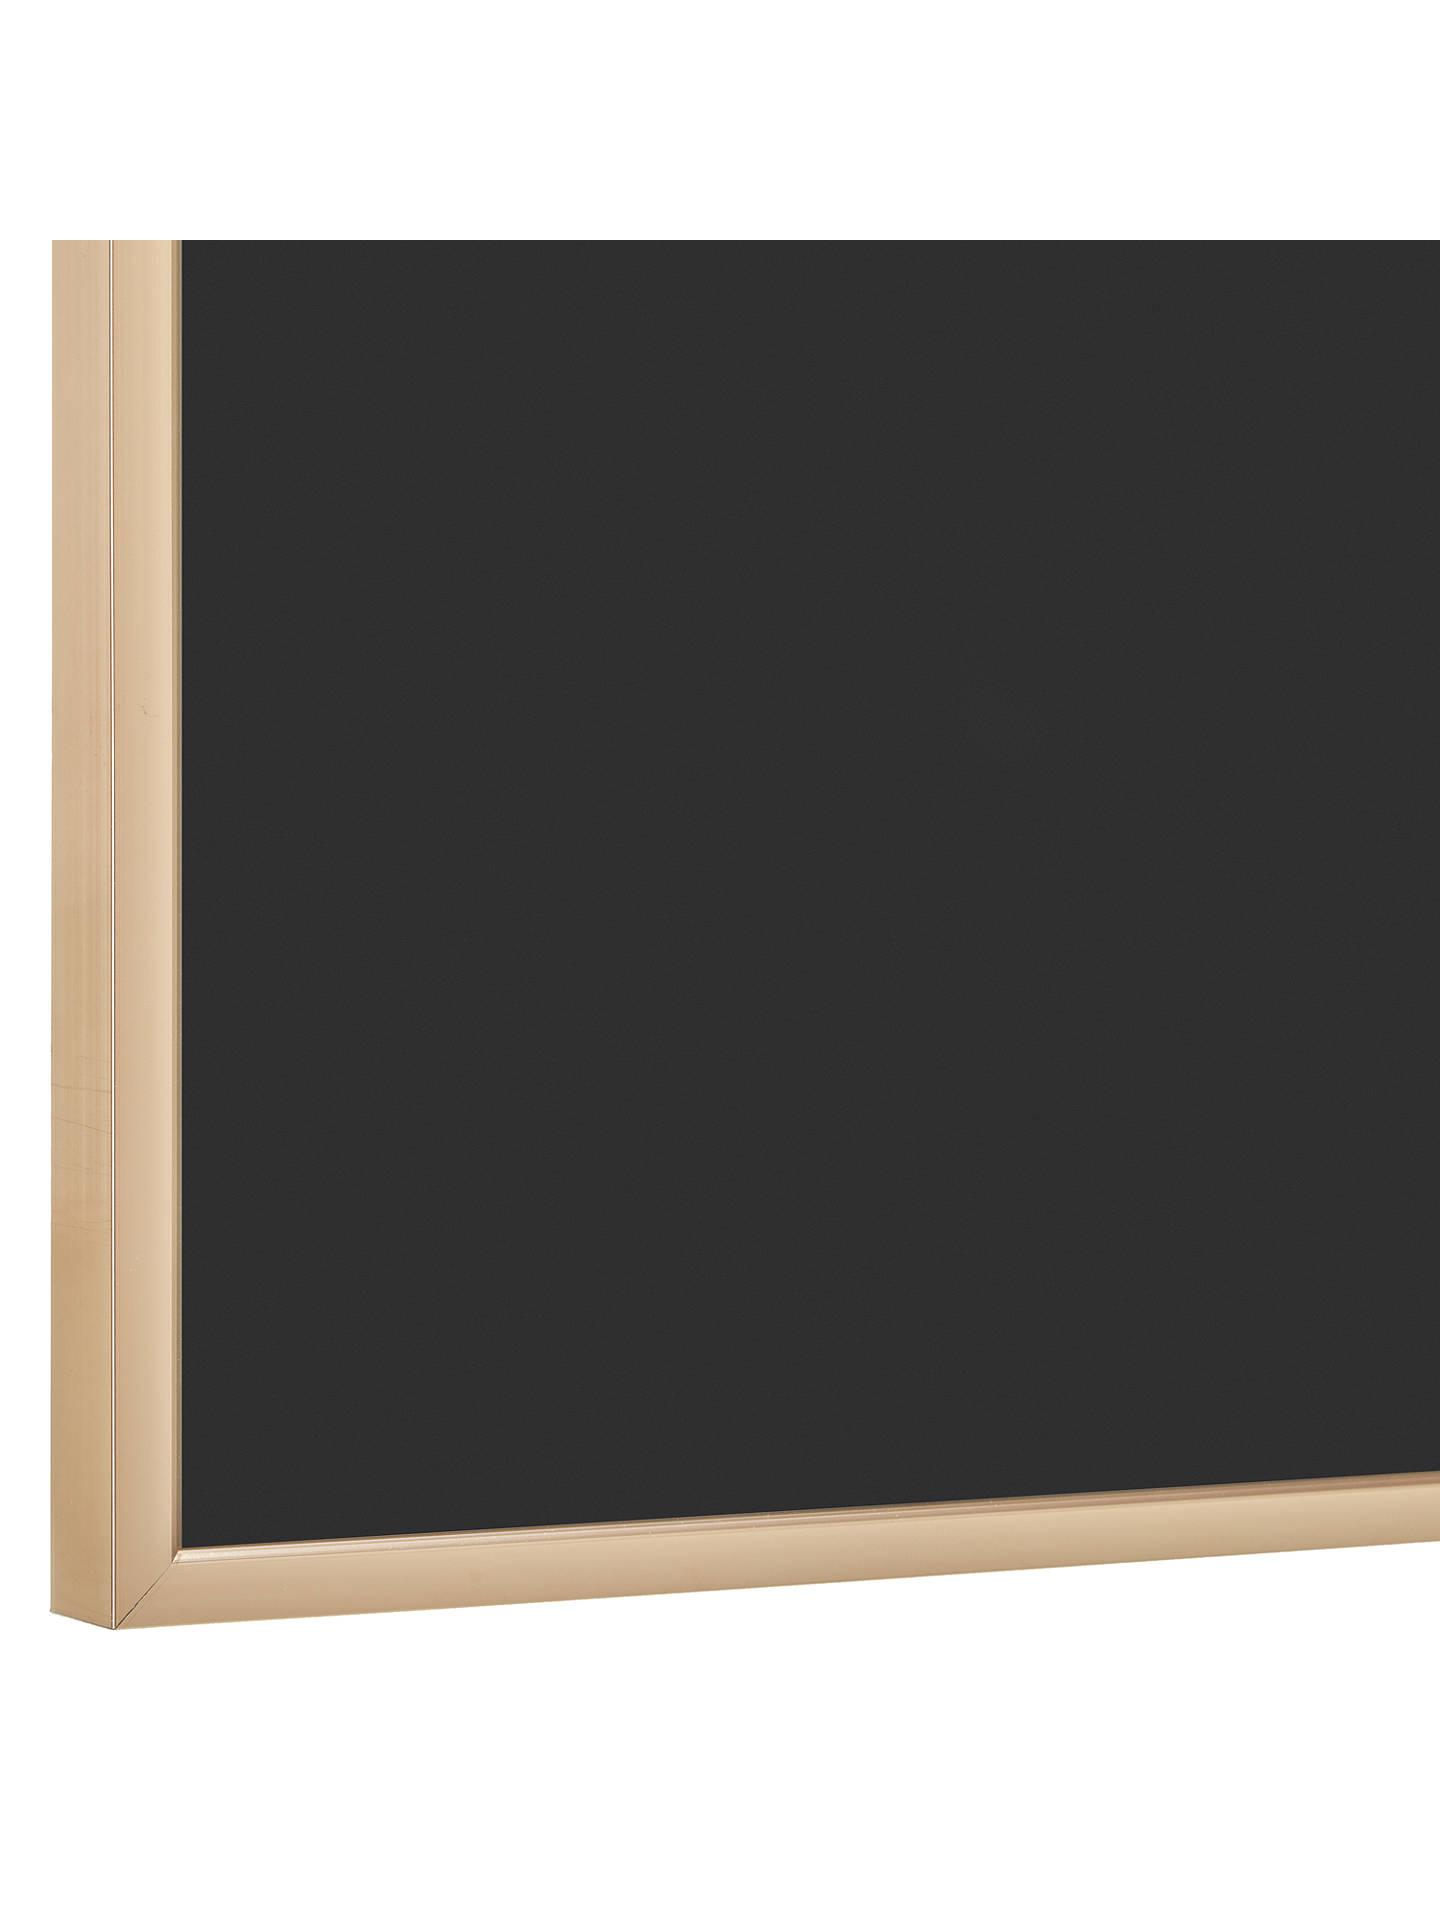 A2 Frame Rose Gold | Allframes5.org